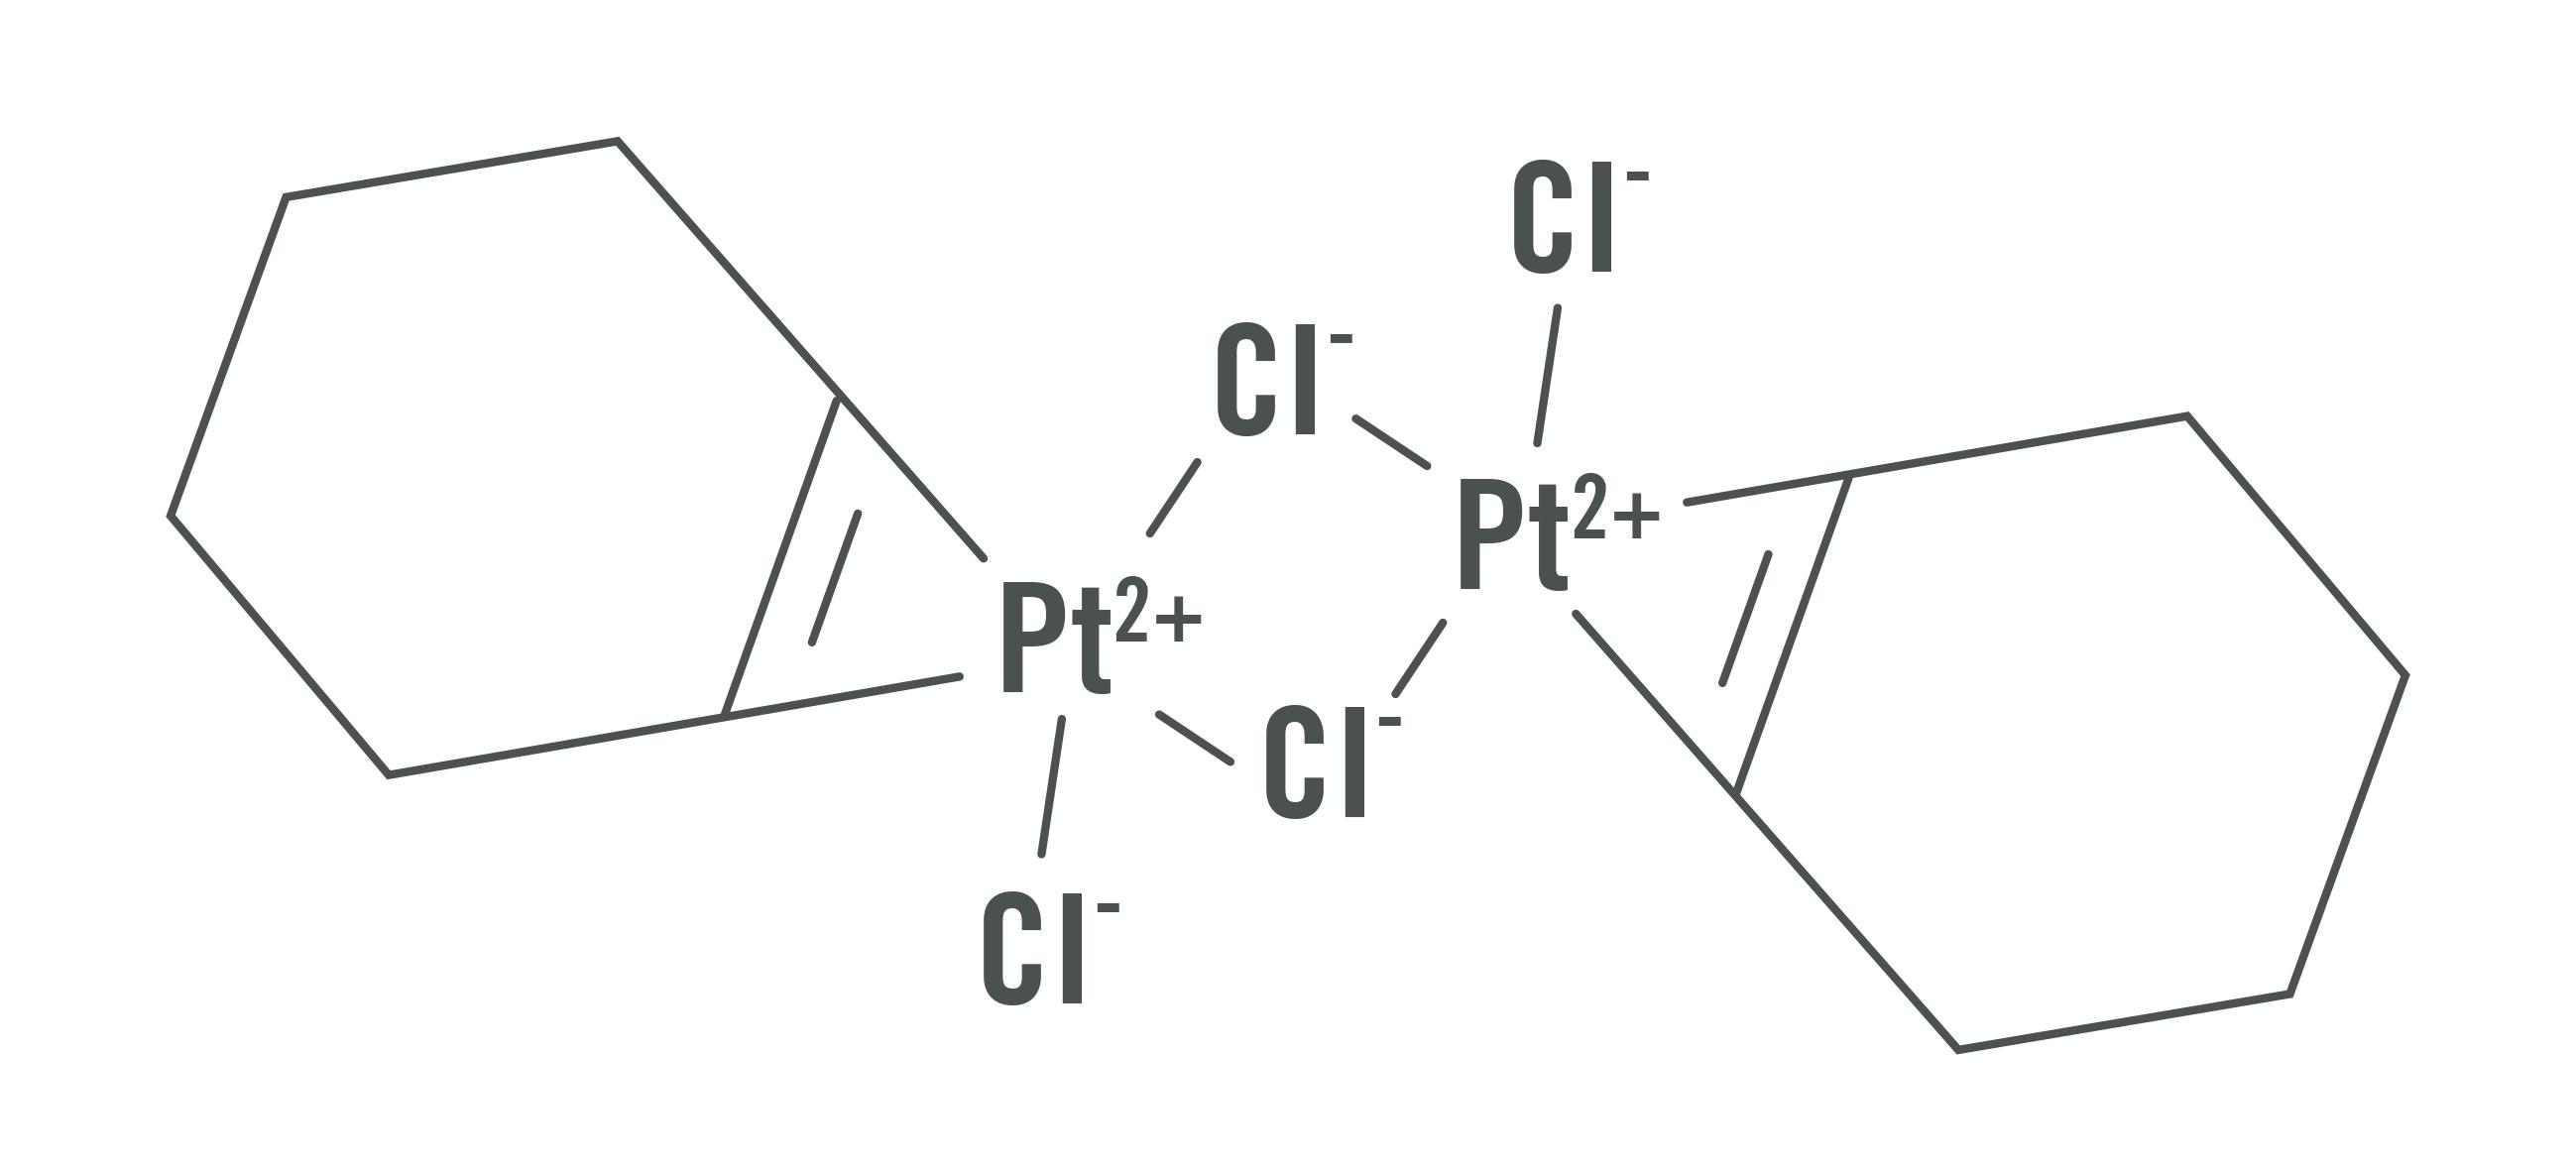 Di-µ-chloro-bis(cyclohexene)platinum(II)